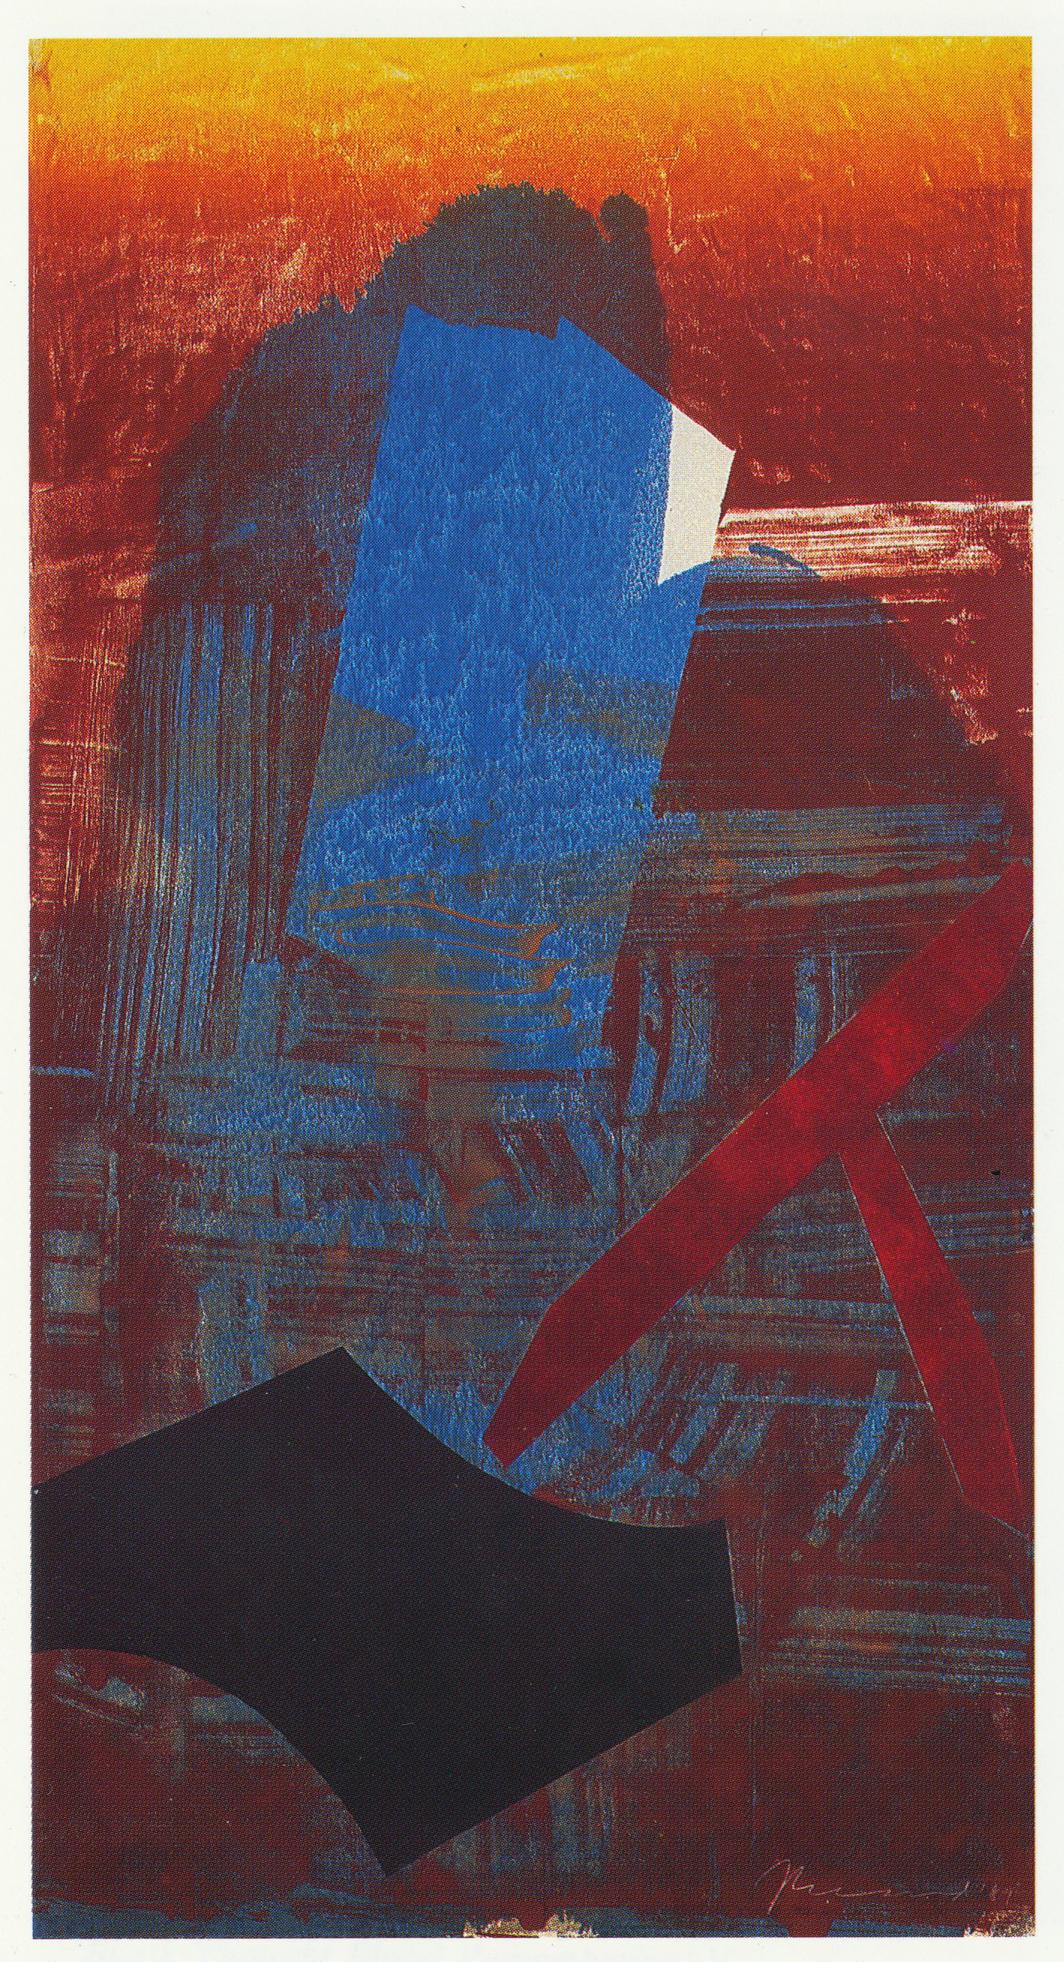 101) 'Blank Thought, Blood Remembering' IX, 1989 Monotype 185x99cm.jpeg